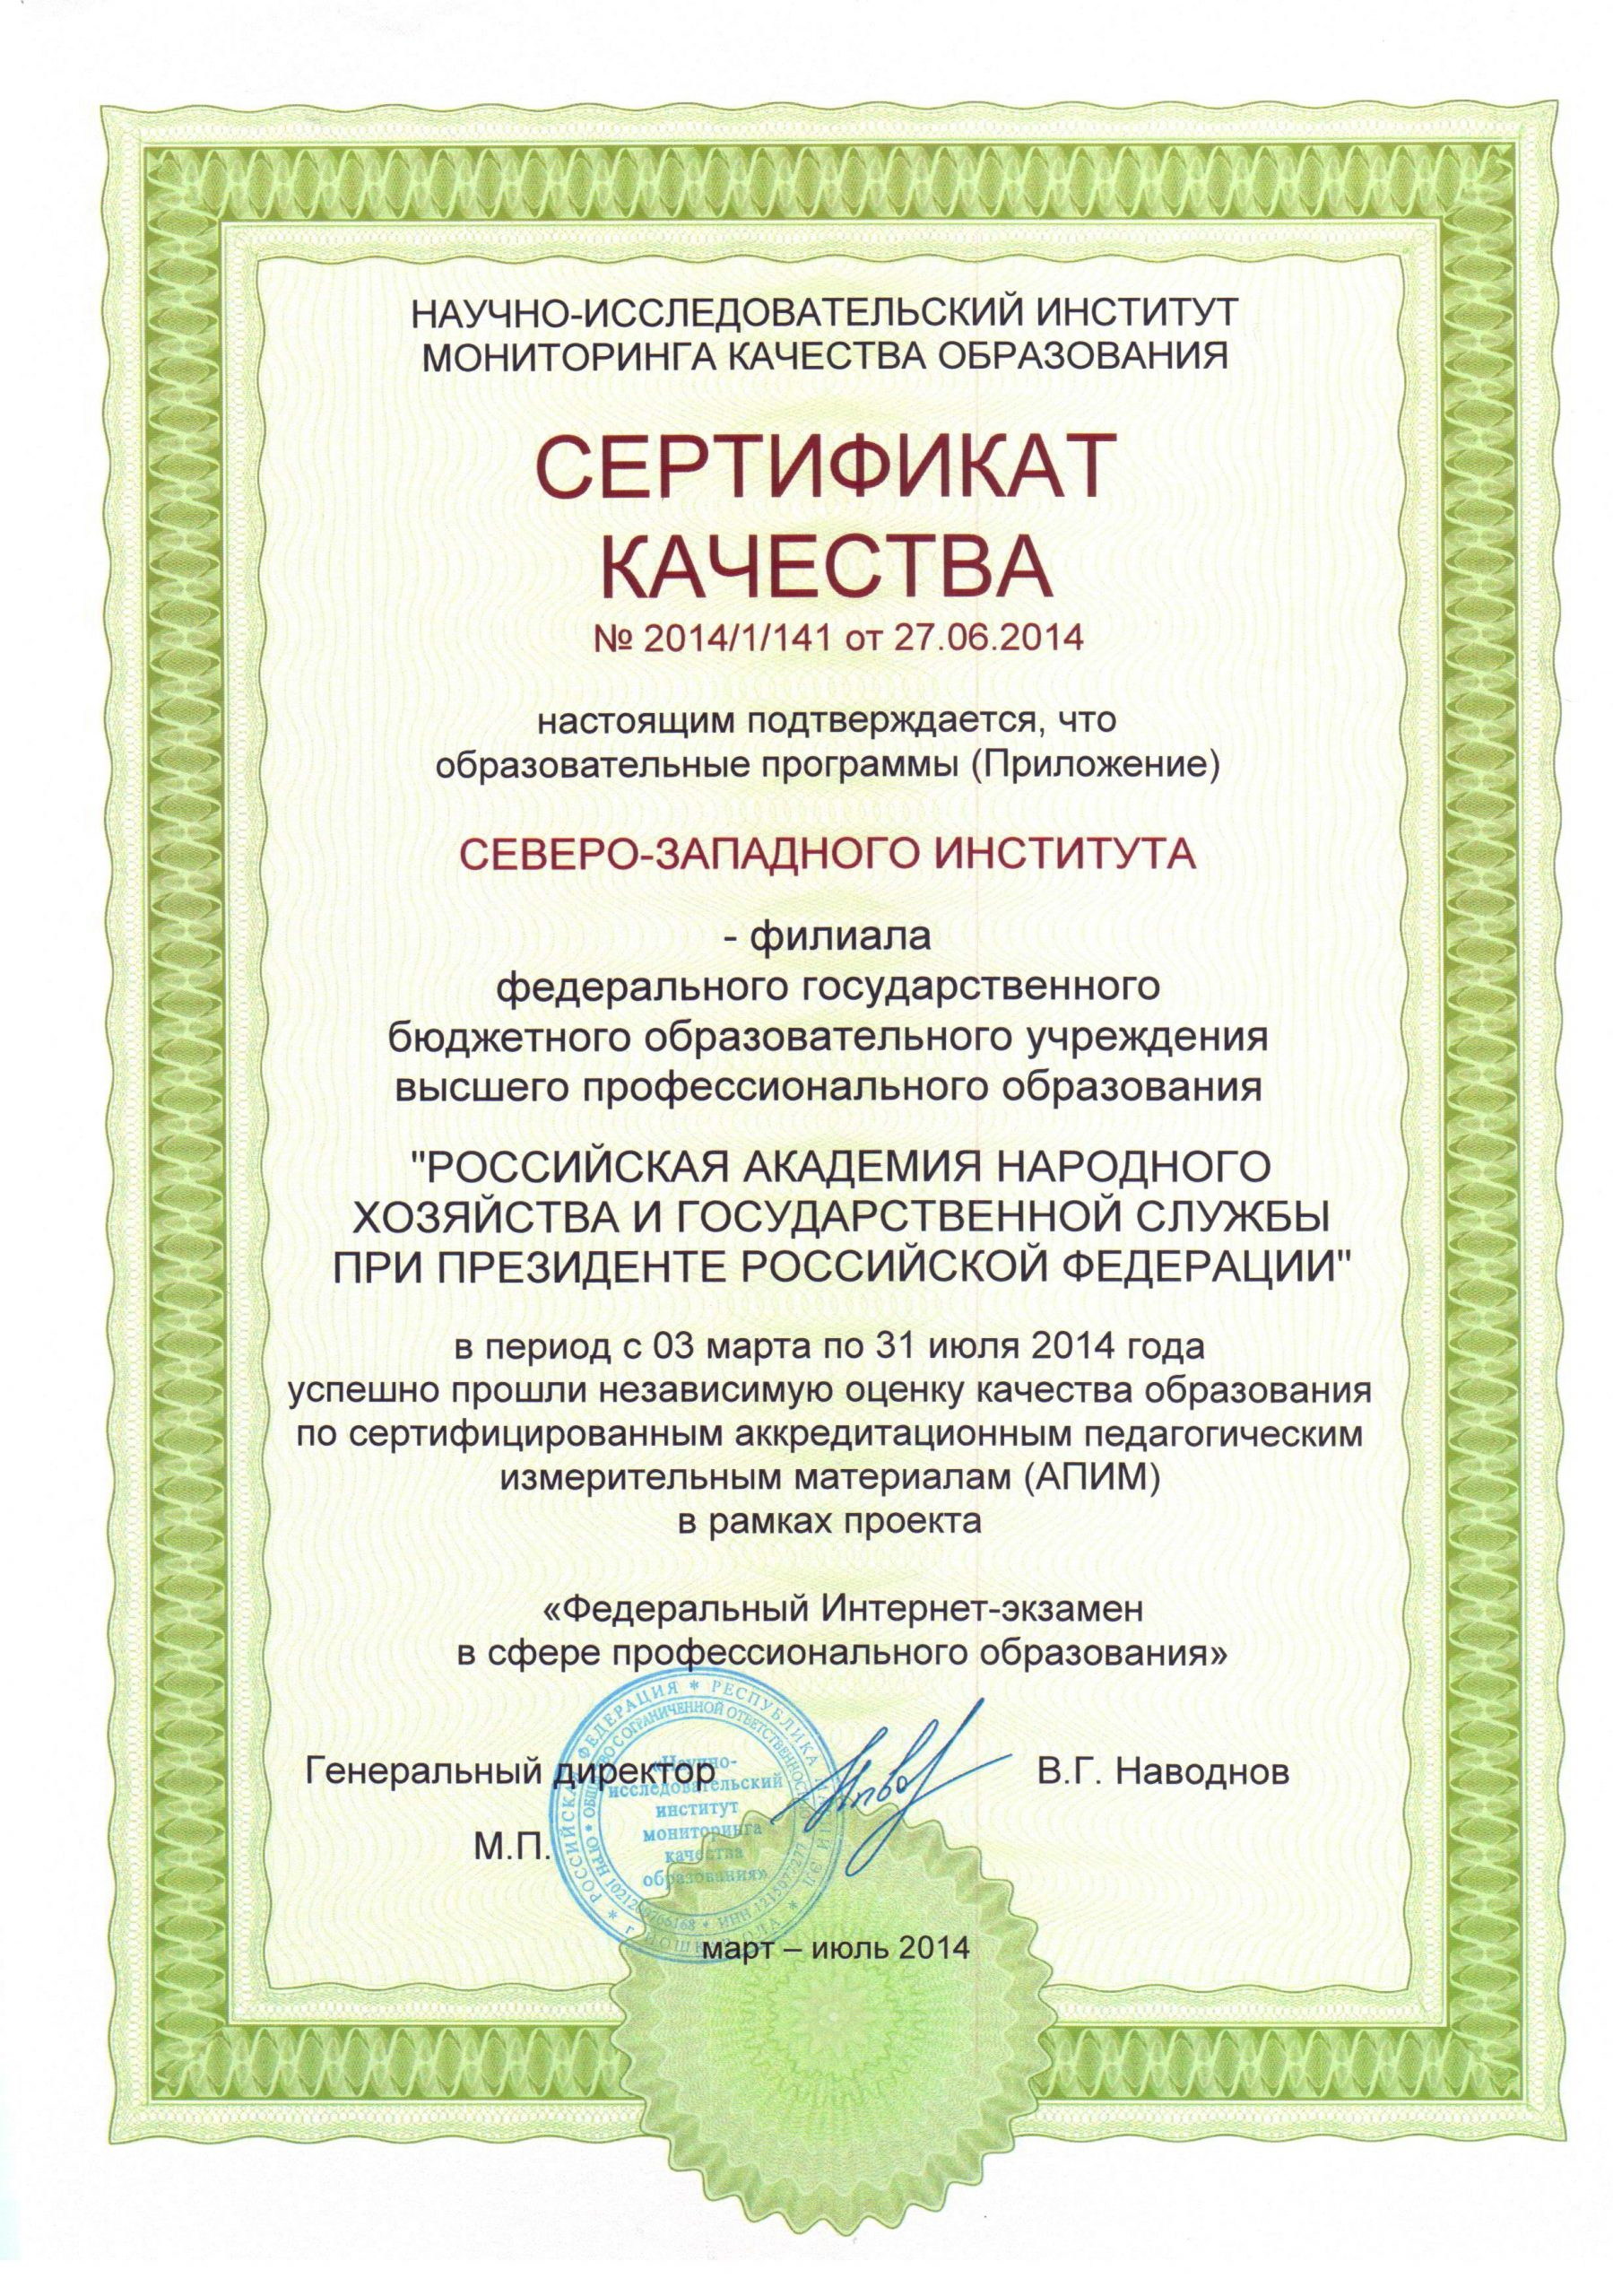 sertificat kachestva 2014